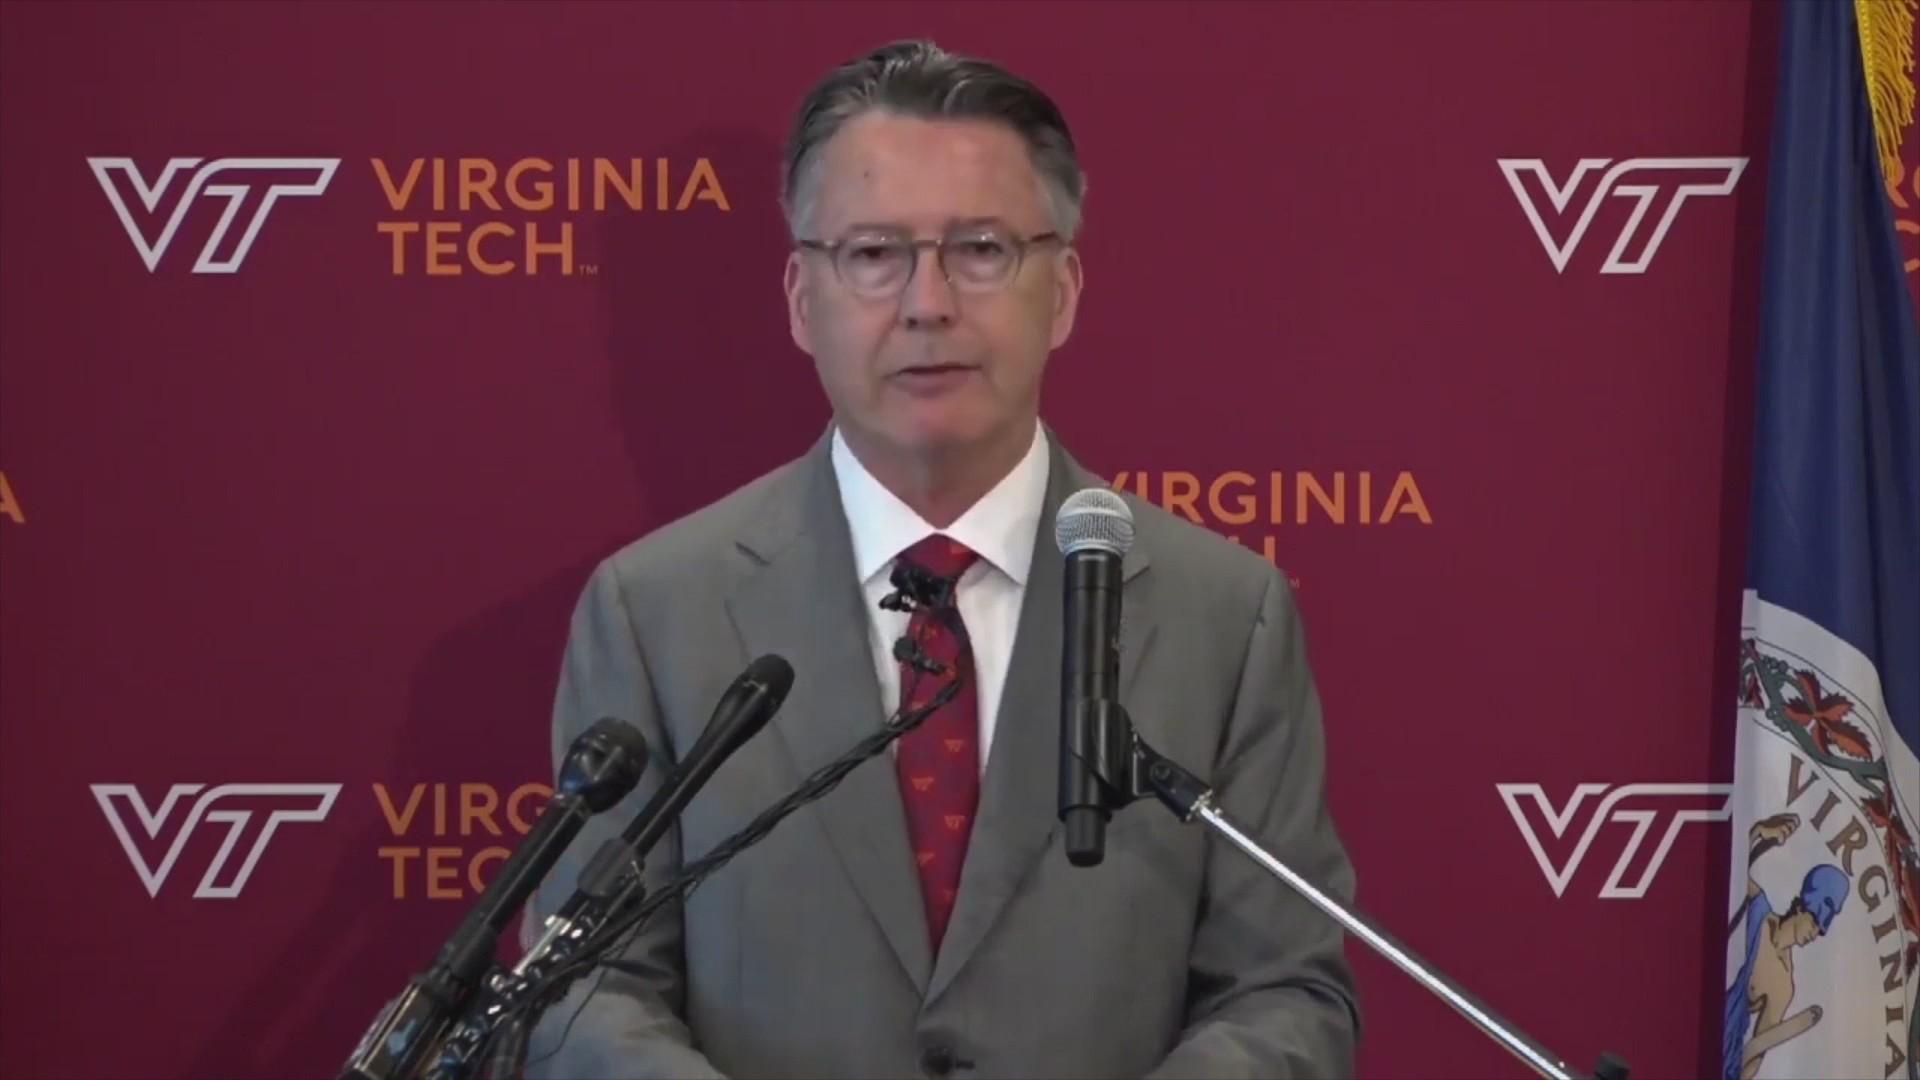 Virginia_Tech_announces_Innovation_campu_0_20190610231827